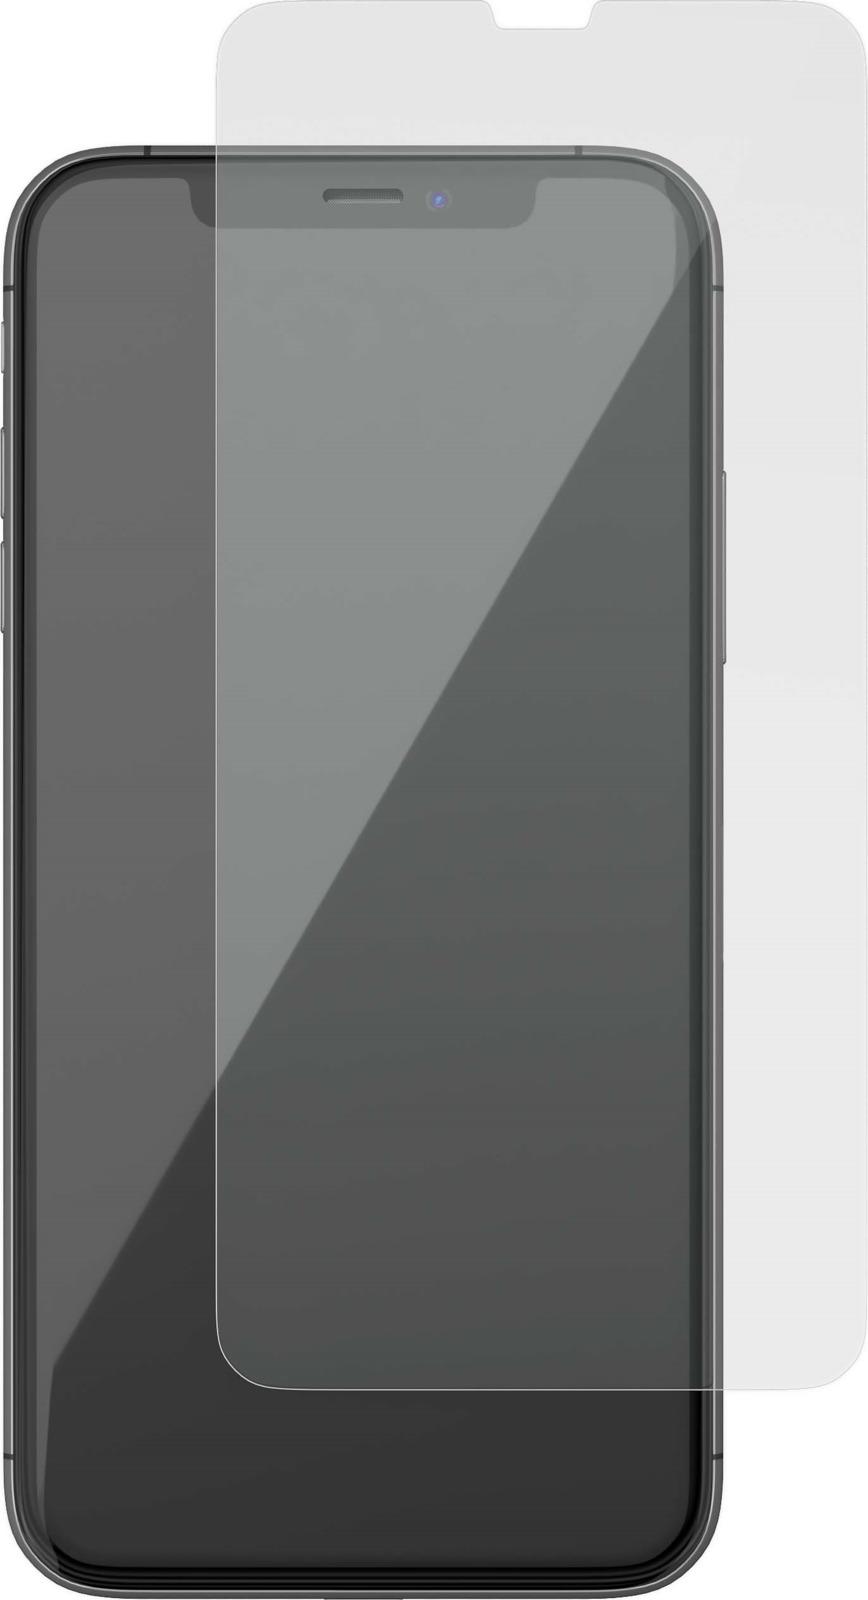 Защитное стекло uBear Premium Glass Screen Protector 0,2 мм для Apple iPhone Xs Max, прозрачный glare free screen protector with cleaning cloth for iphone 3g